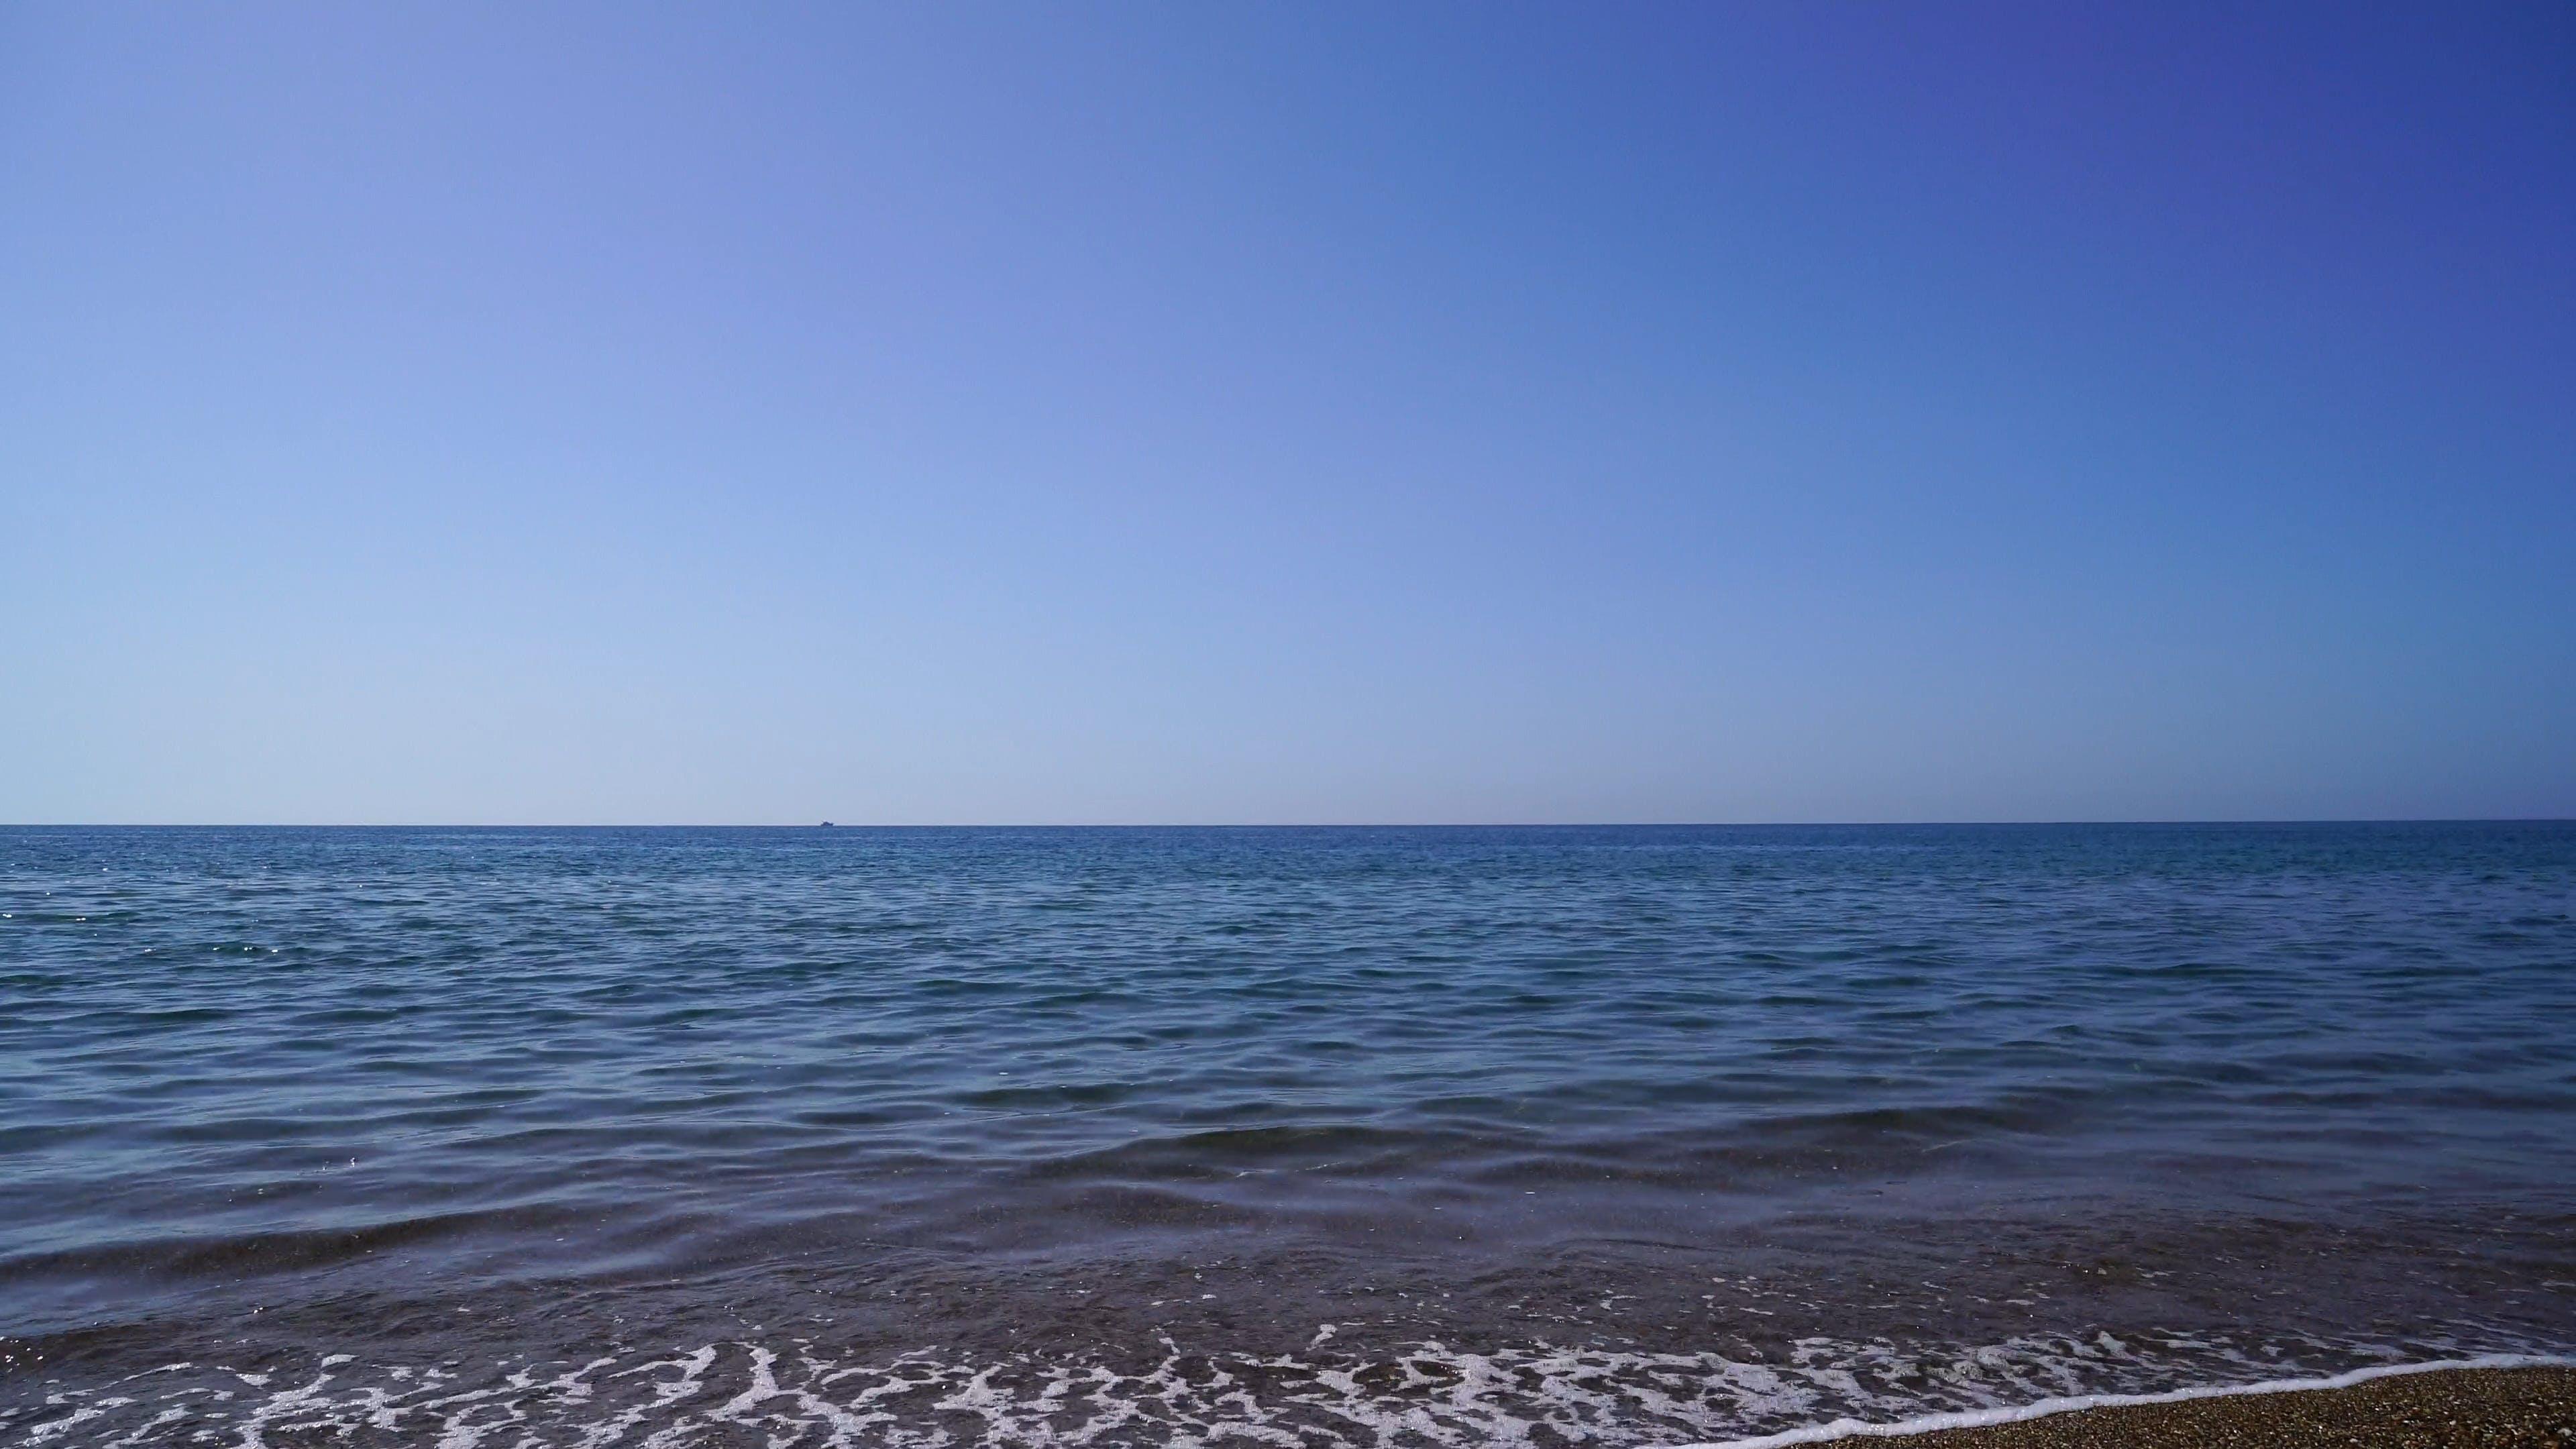 View Of Horizon Over Body Of Water